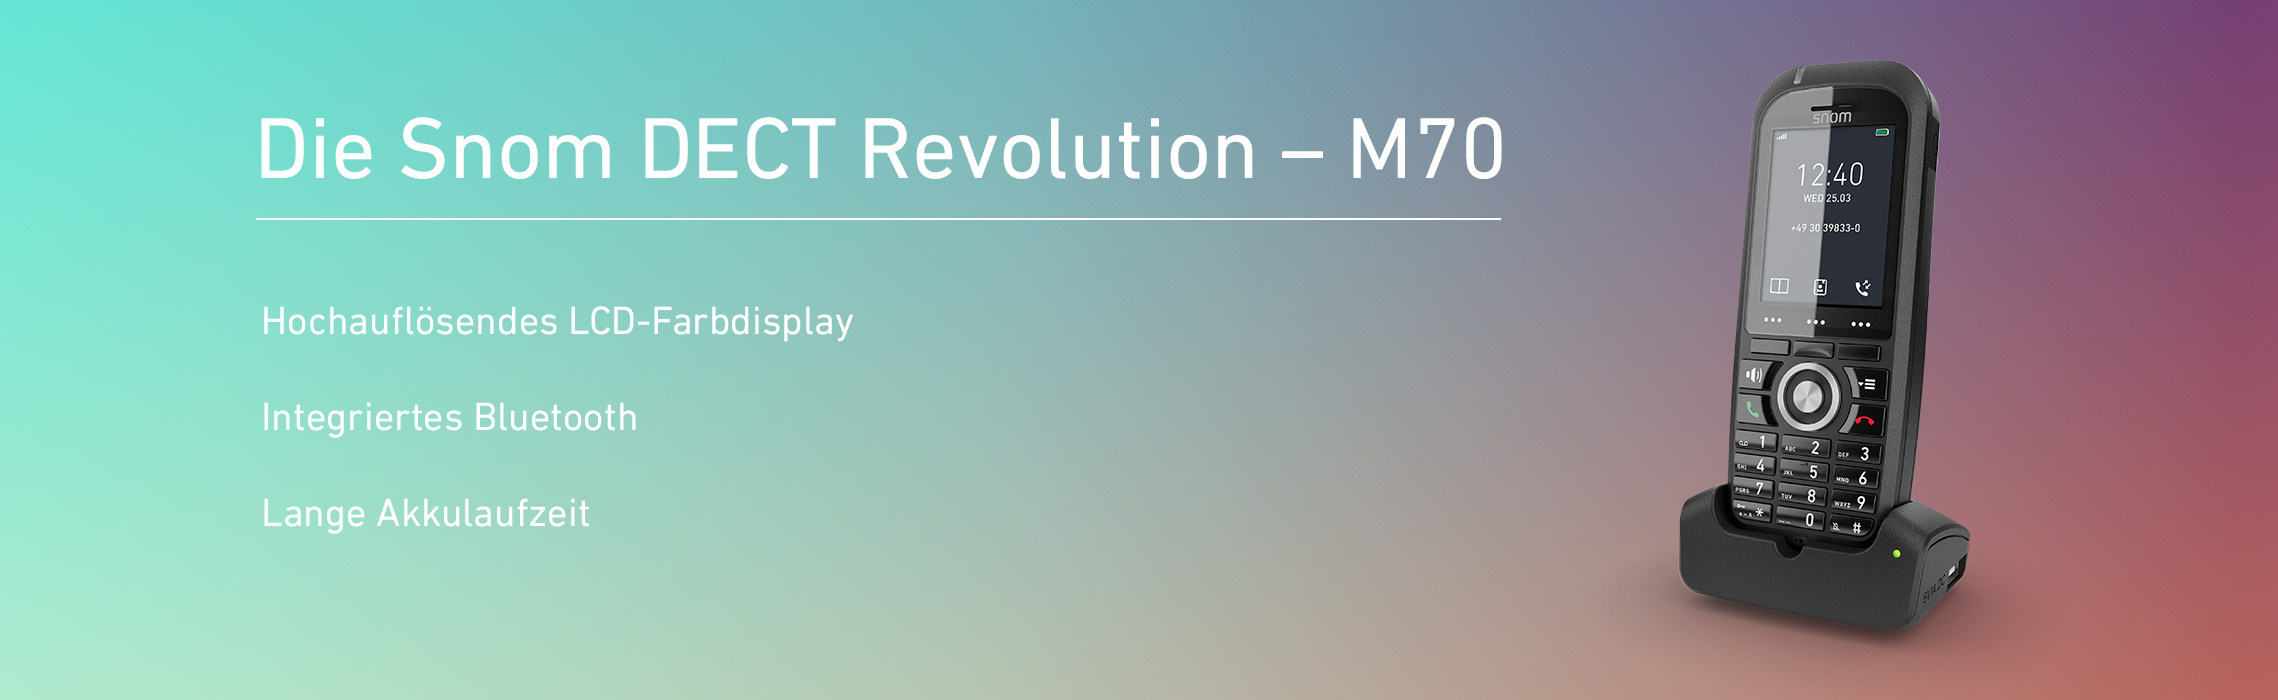 DECT_revolution_website_slider_m70_de.jpg